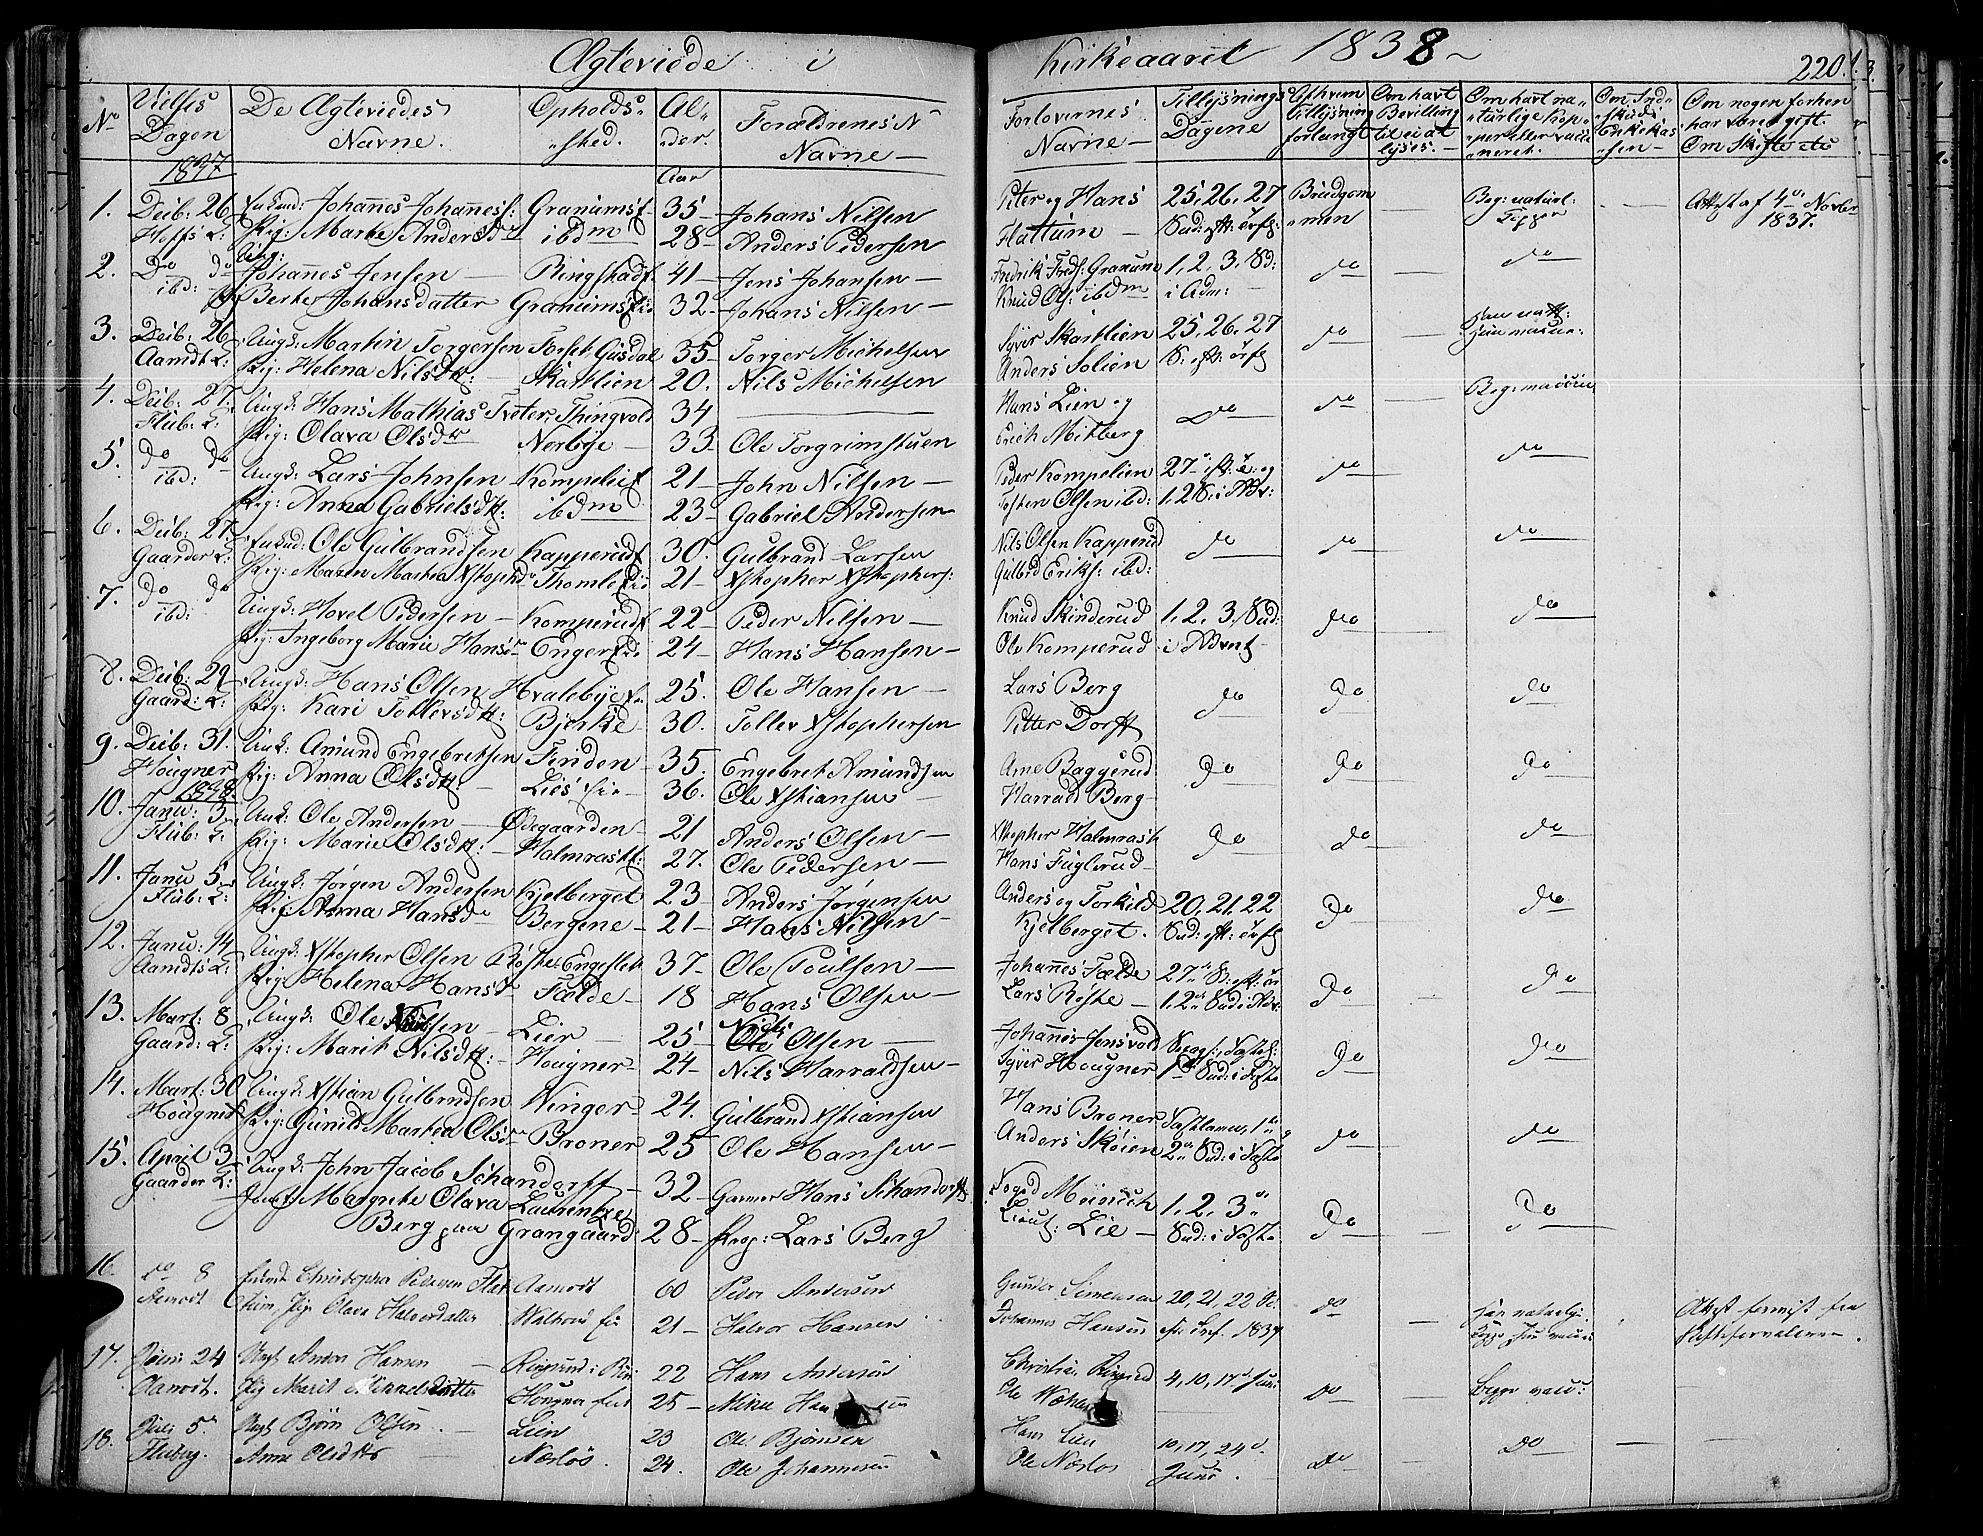 SAH, Land prestekontor, Ministerialbok nr. 8, 1830-1846, s. 220